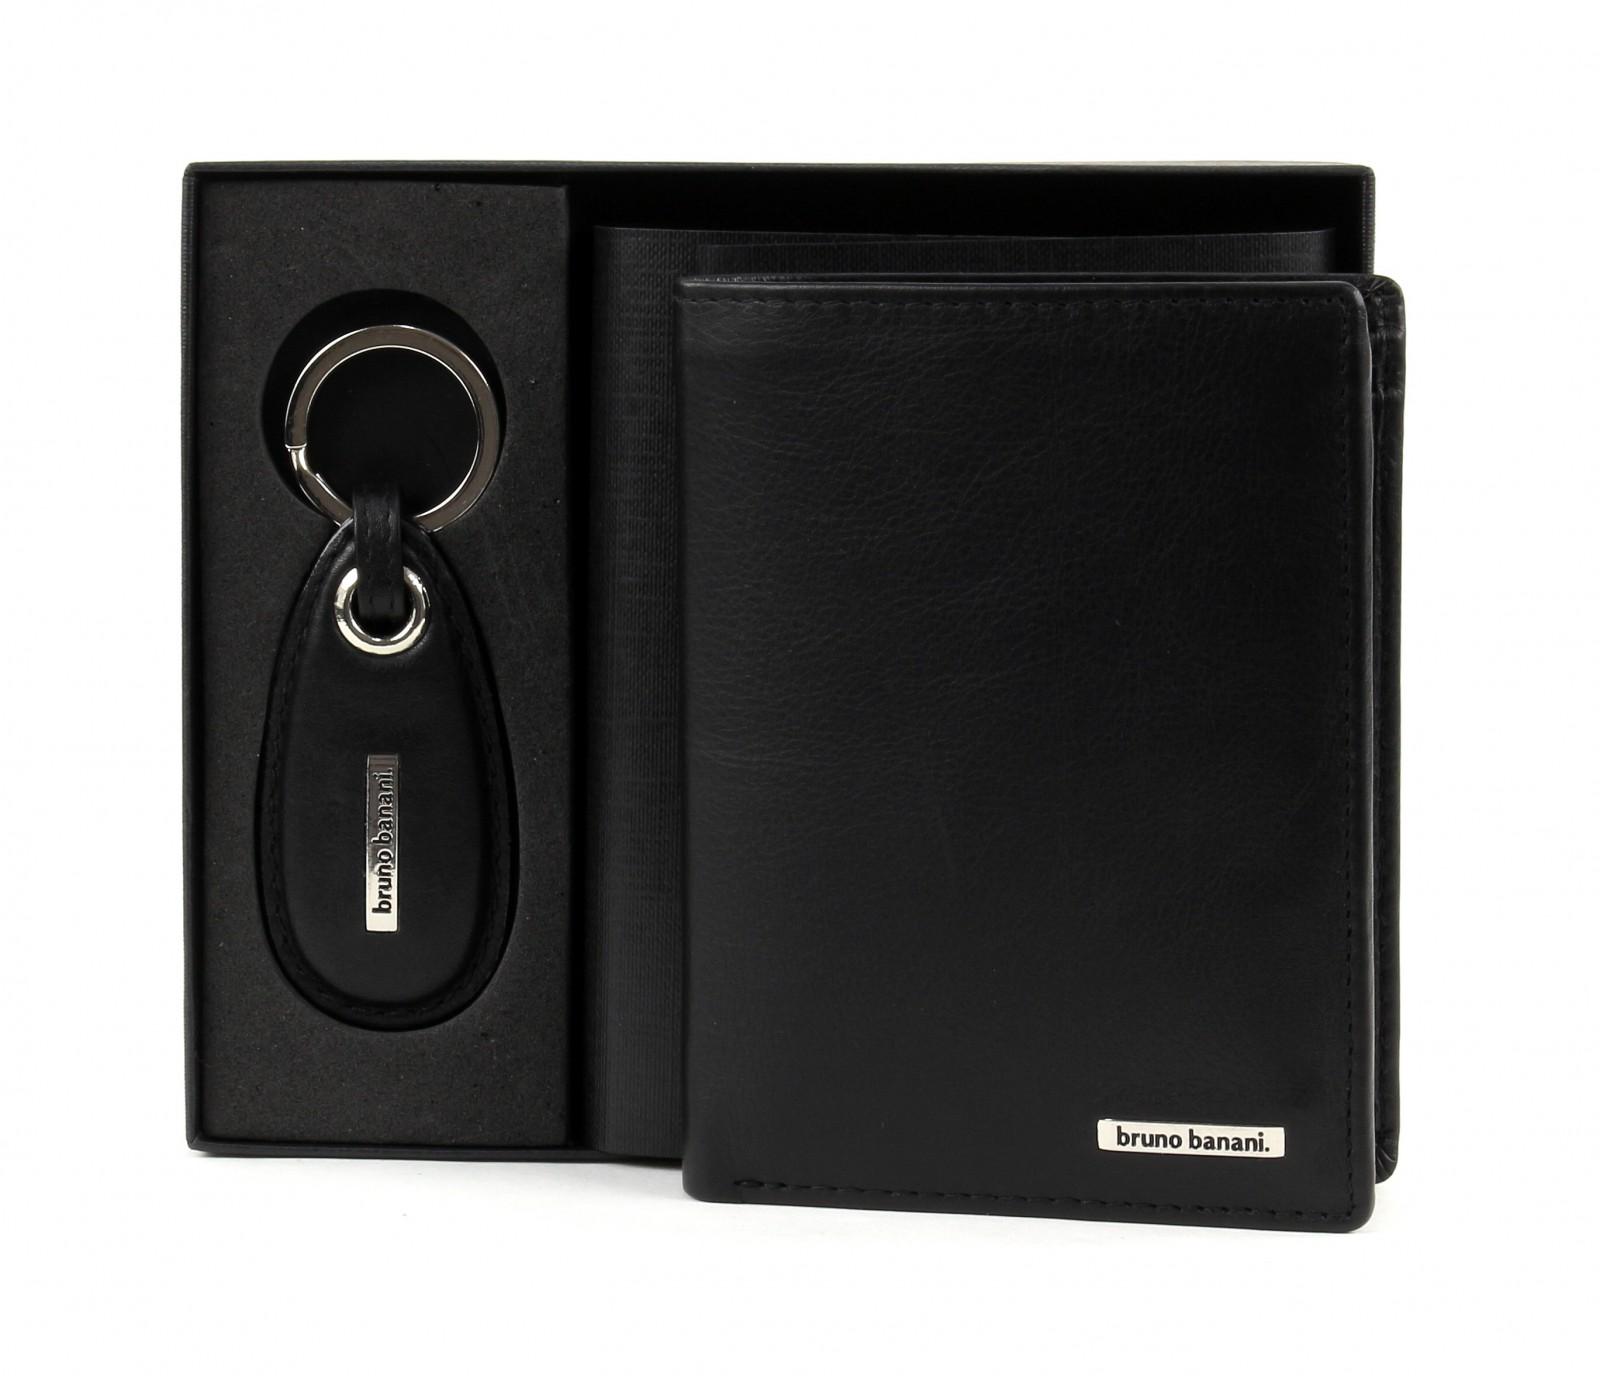 bruno banani Gift Box Set Slim Wallet High / Keychain Black